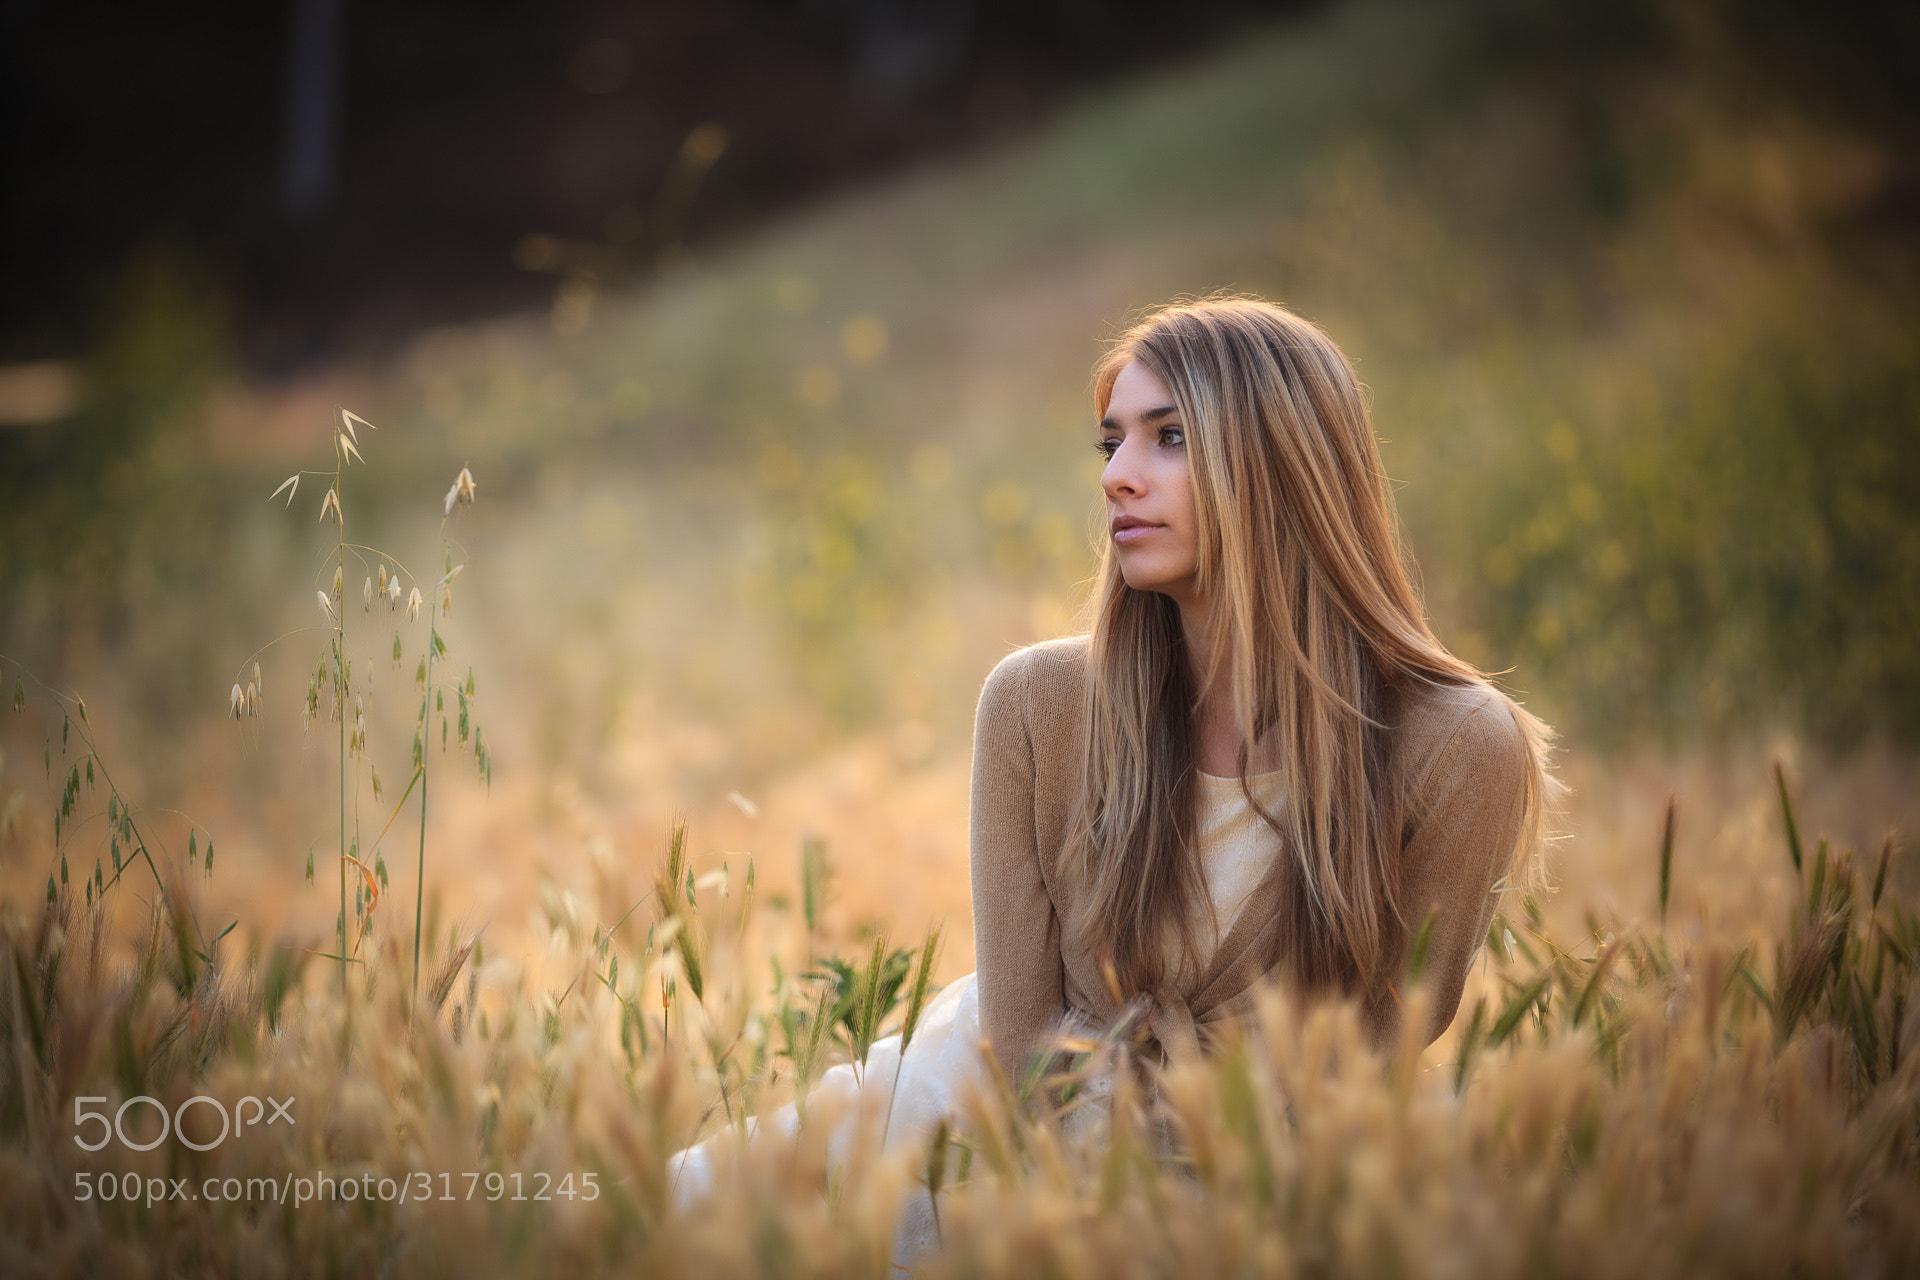 Photograph Dusk Toned Beauty by Steve Skinner on 500px